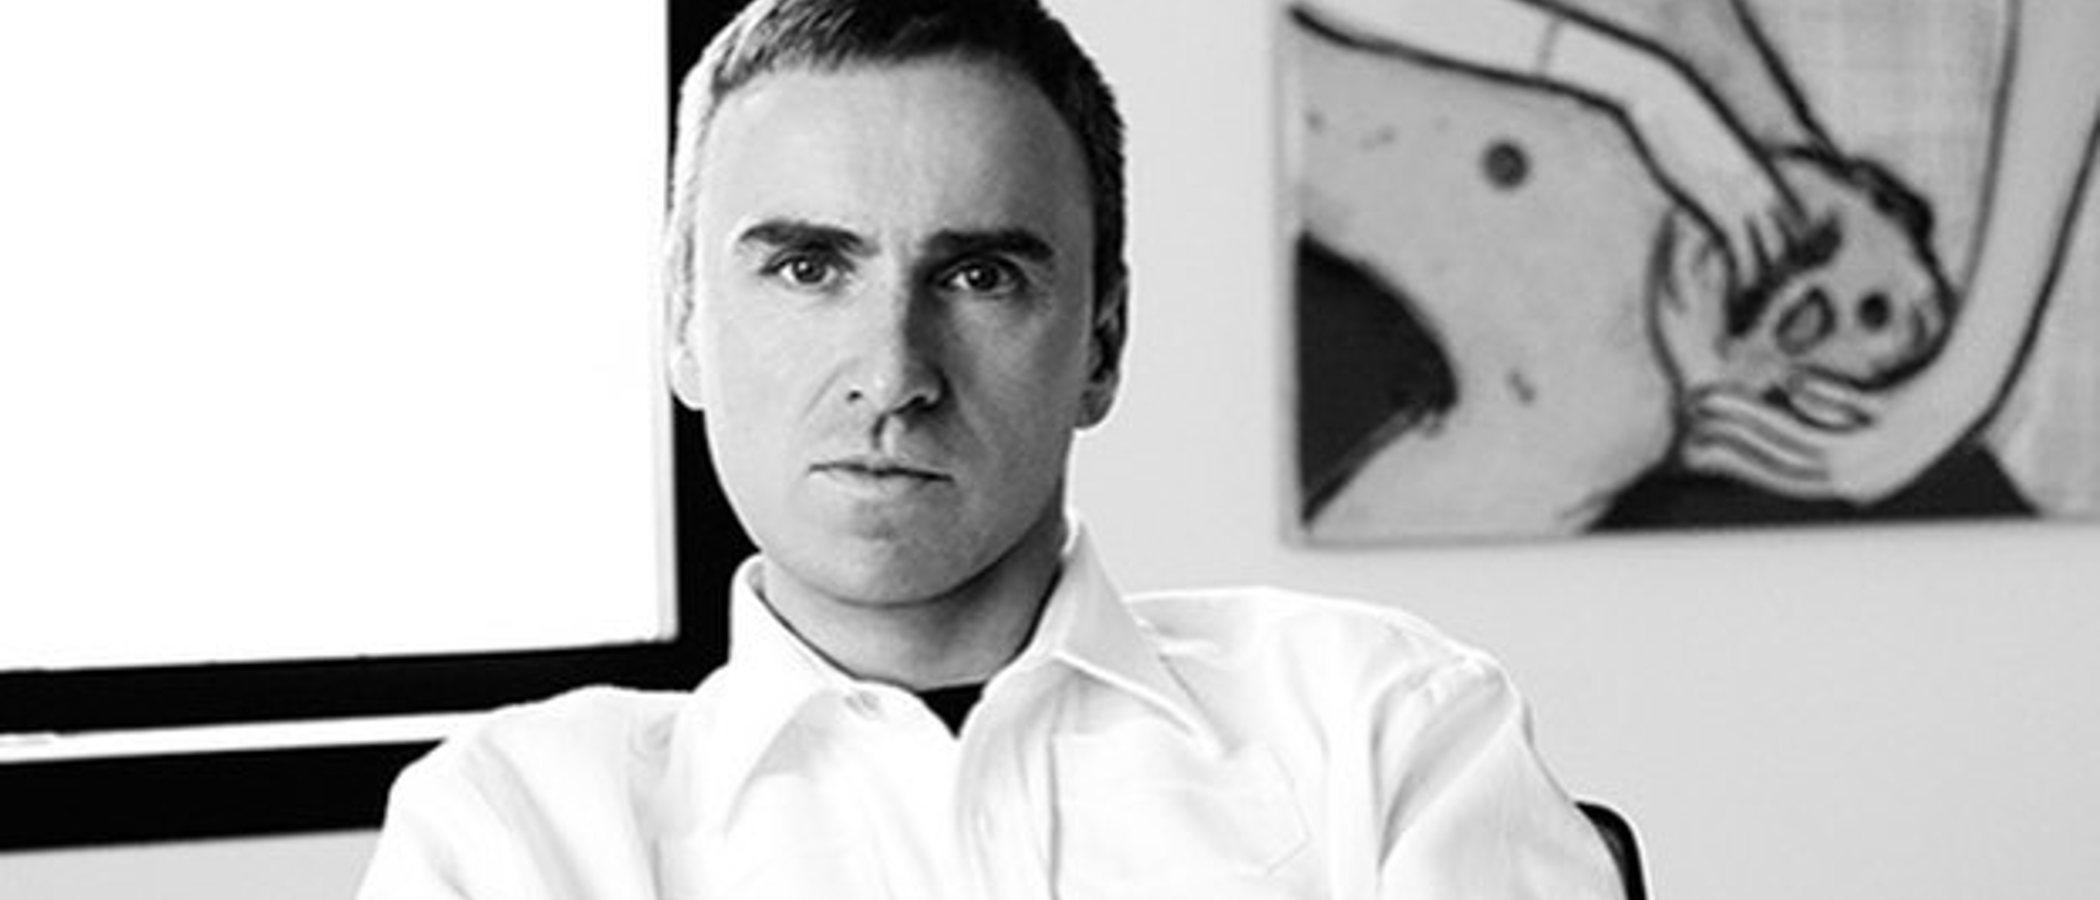 Raf Simons, director creativo de Calvin Klein, deja la firma